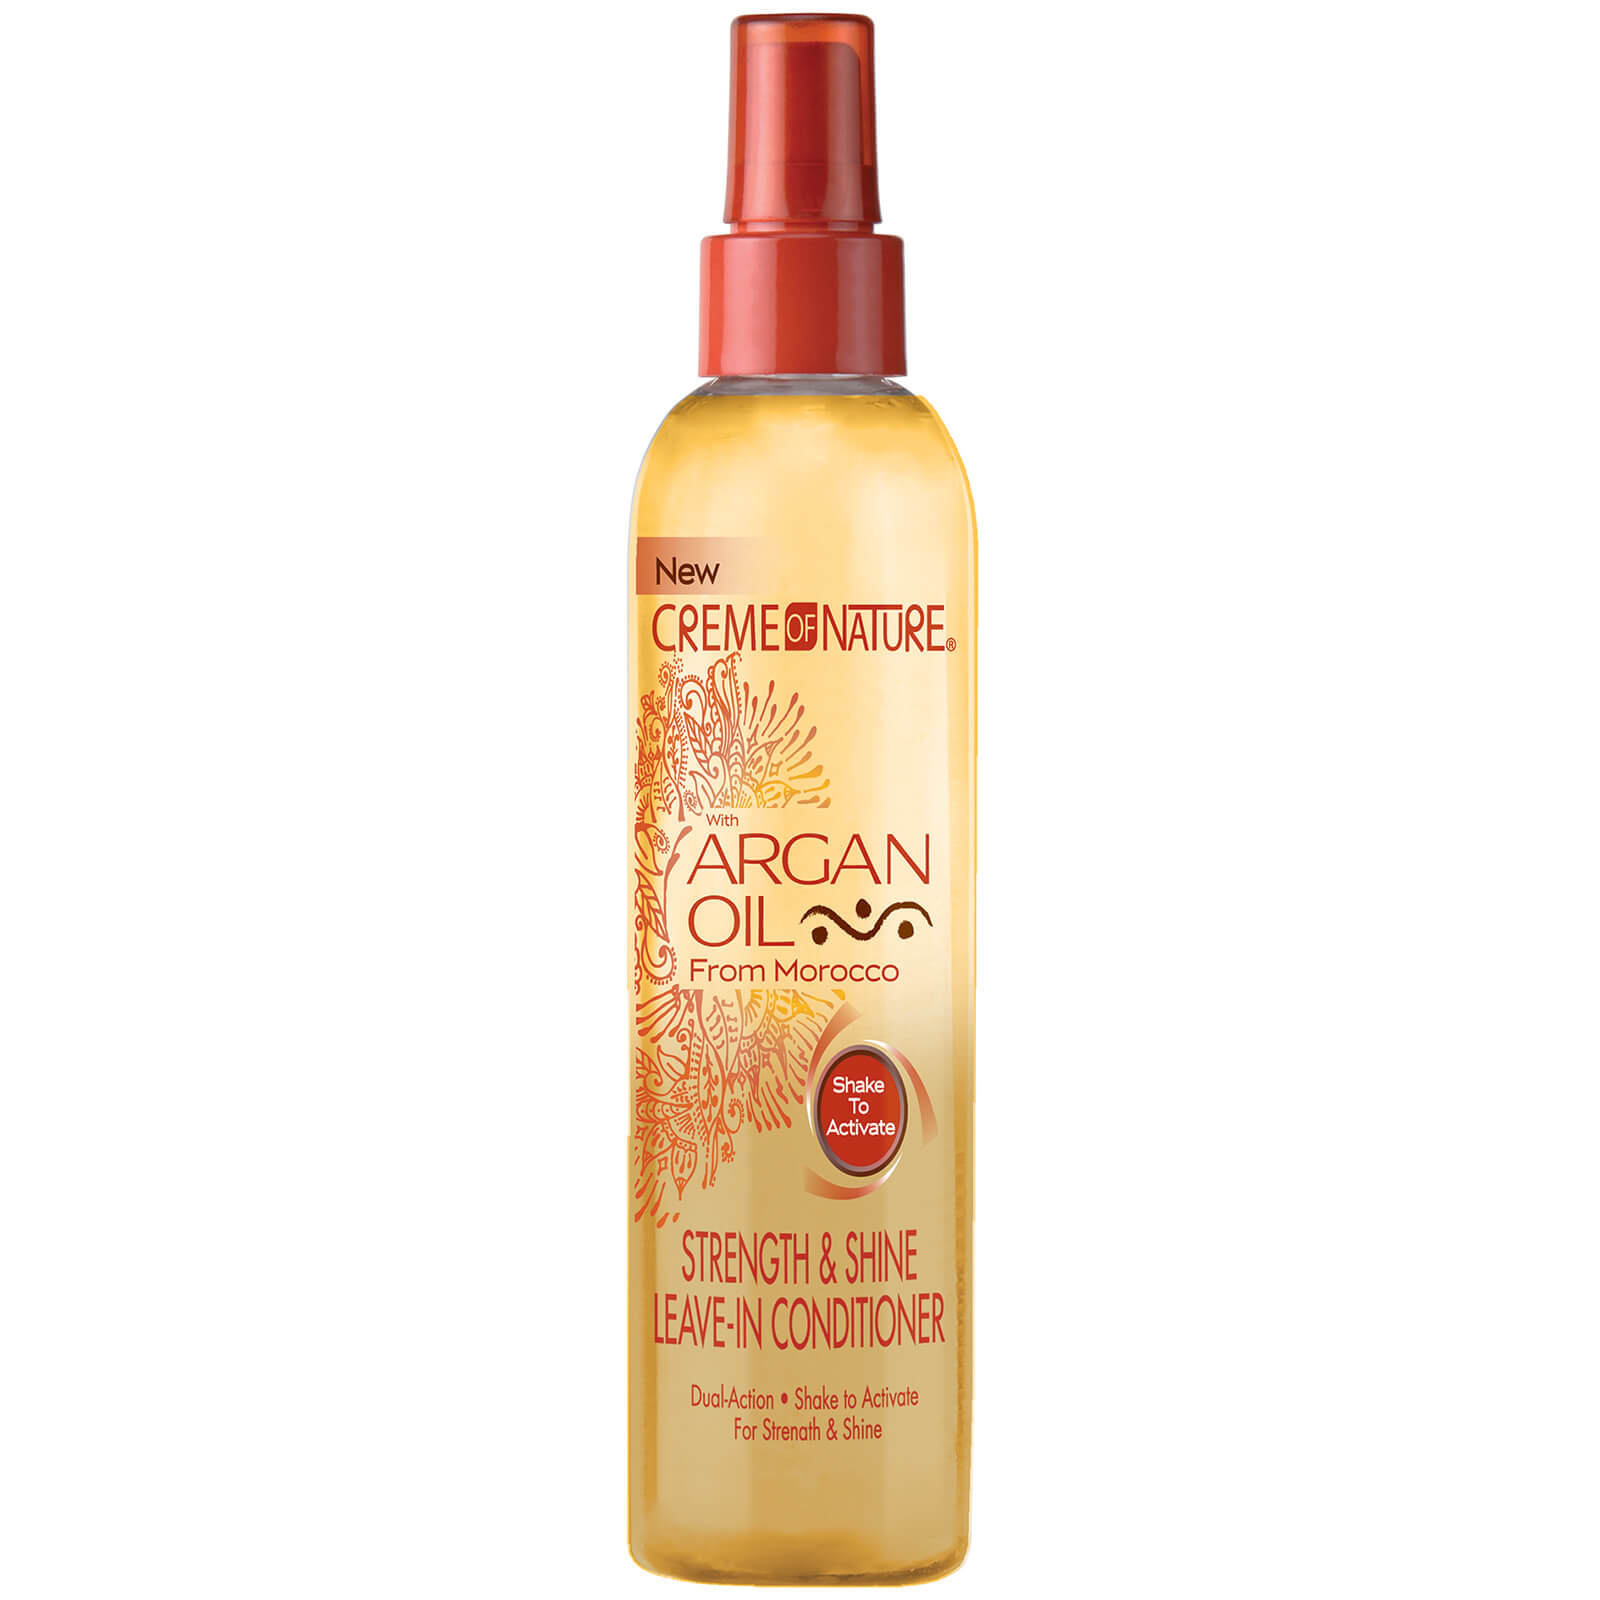 Купить Crème of Nature Argan oil Strength & Shine Leave-in Conditioner 250ml